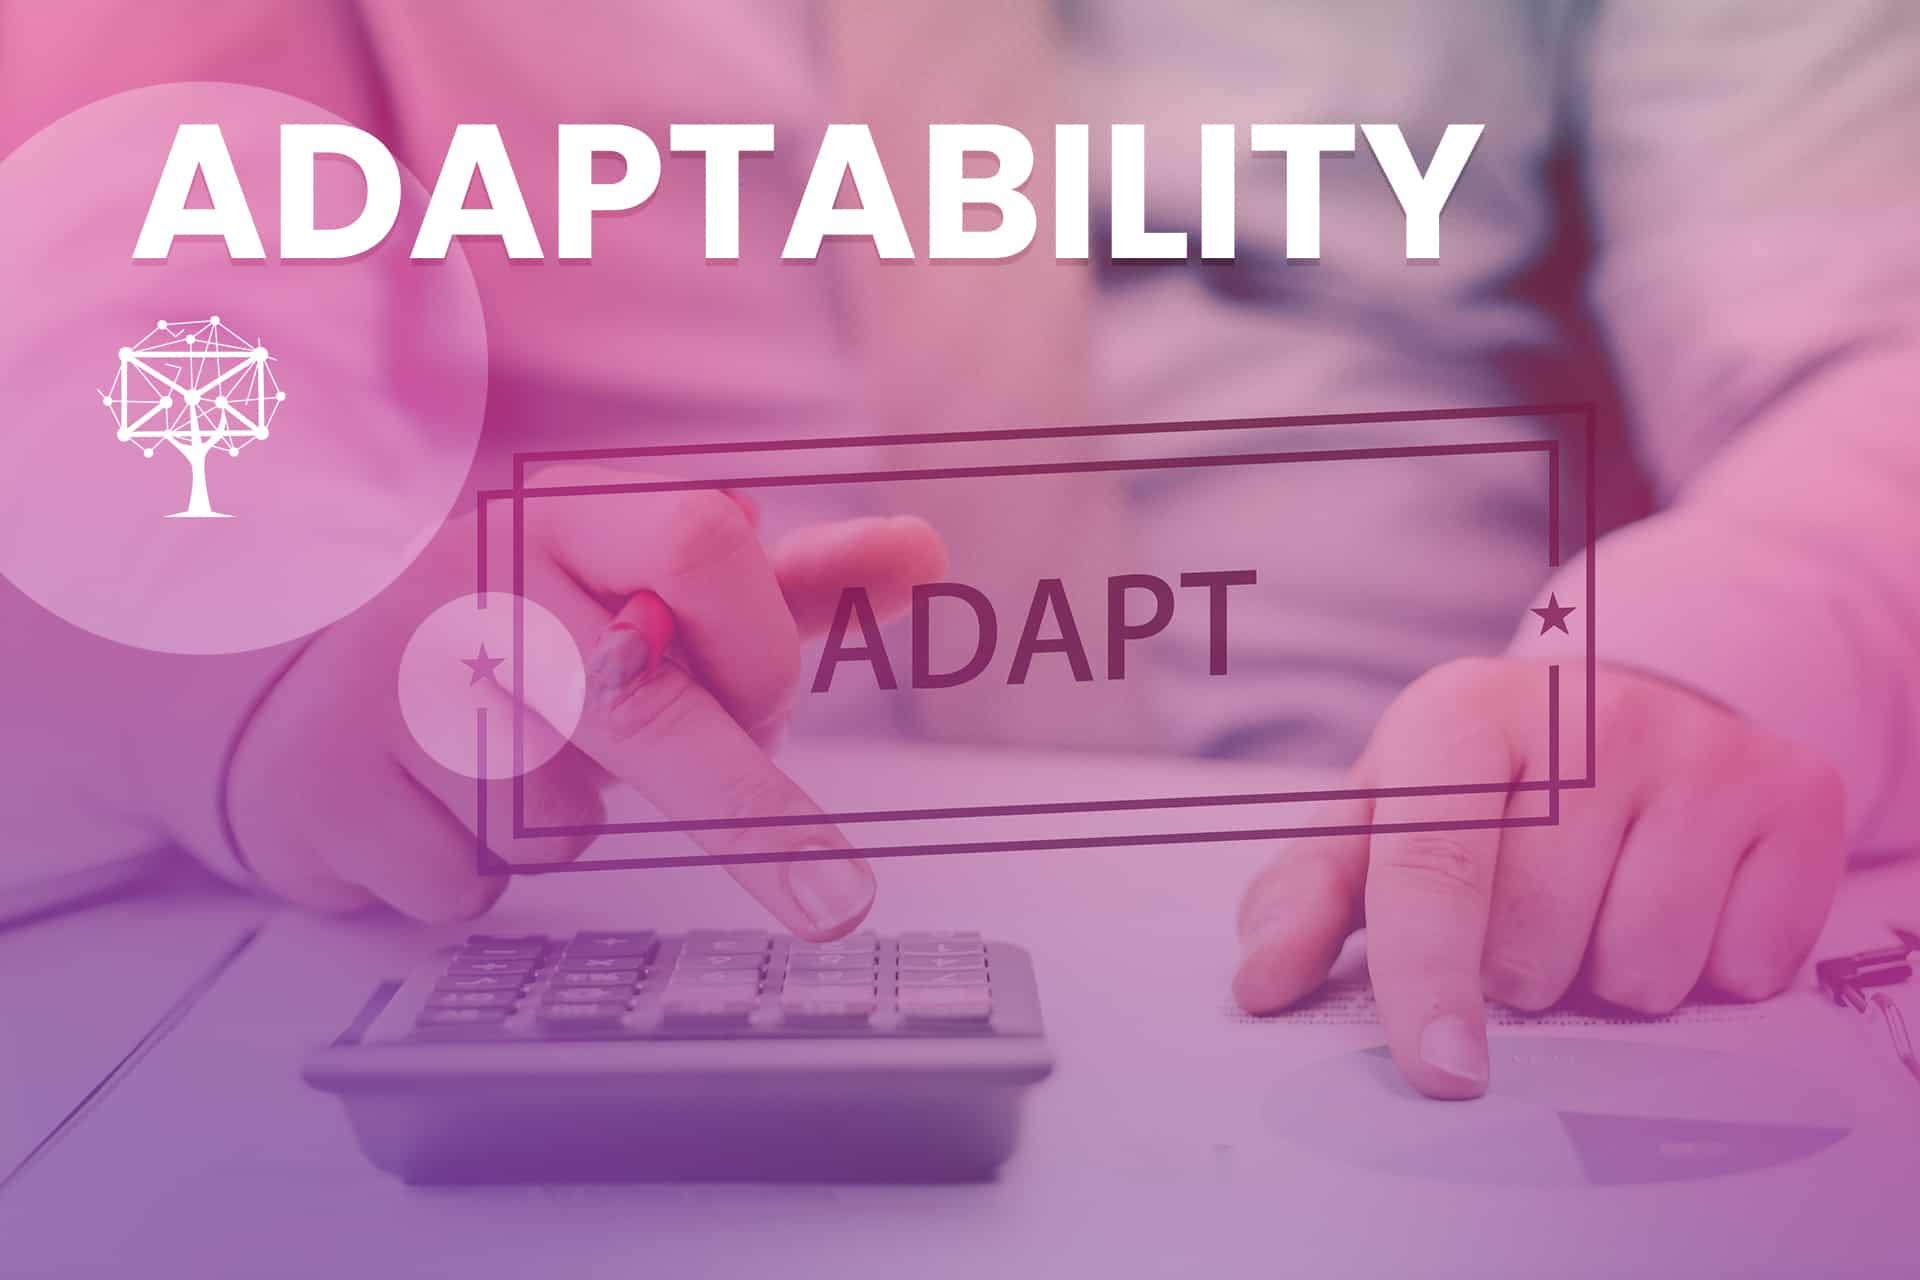 Adaptability is a customer service skill